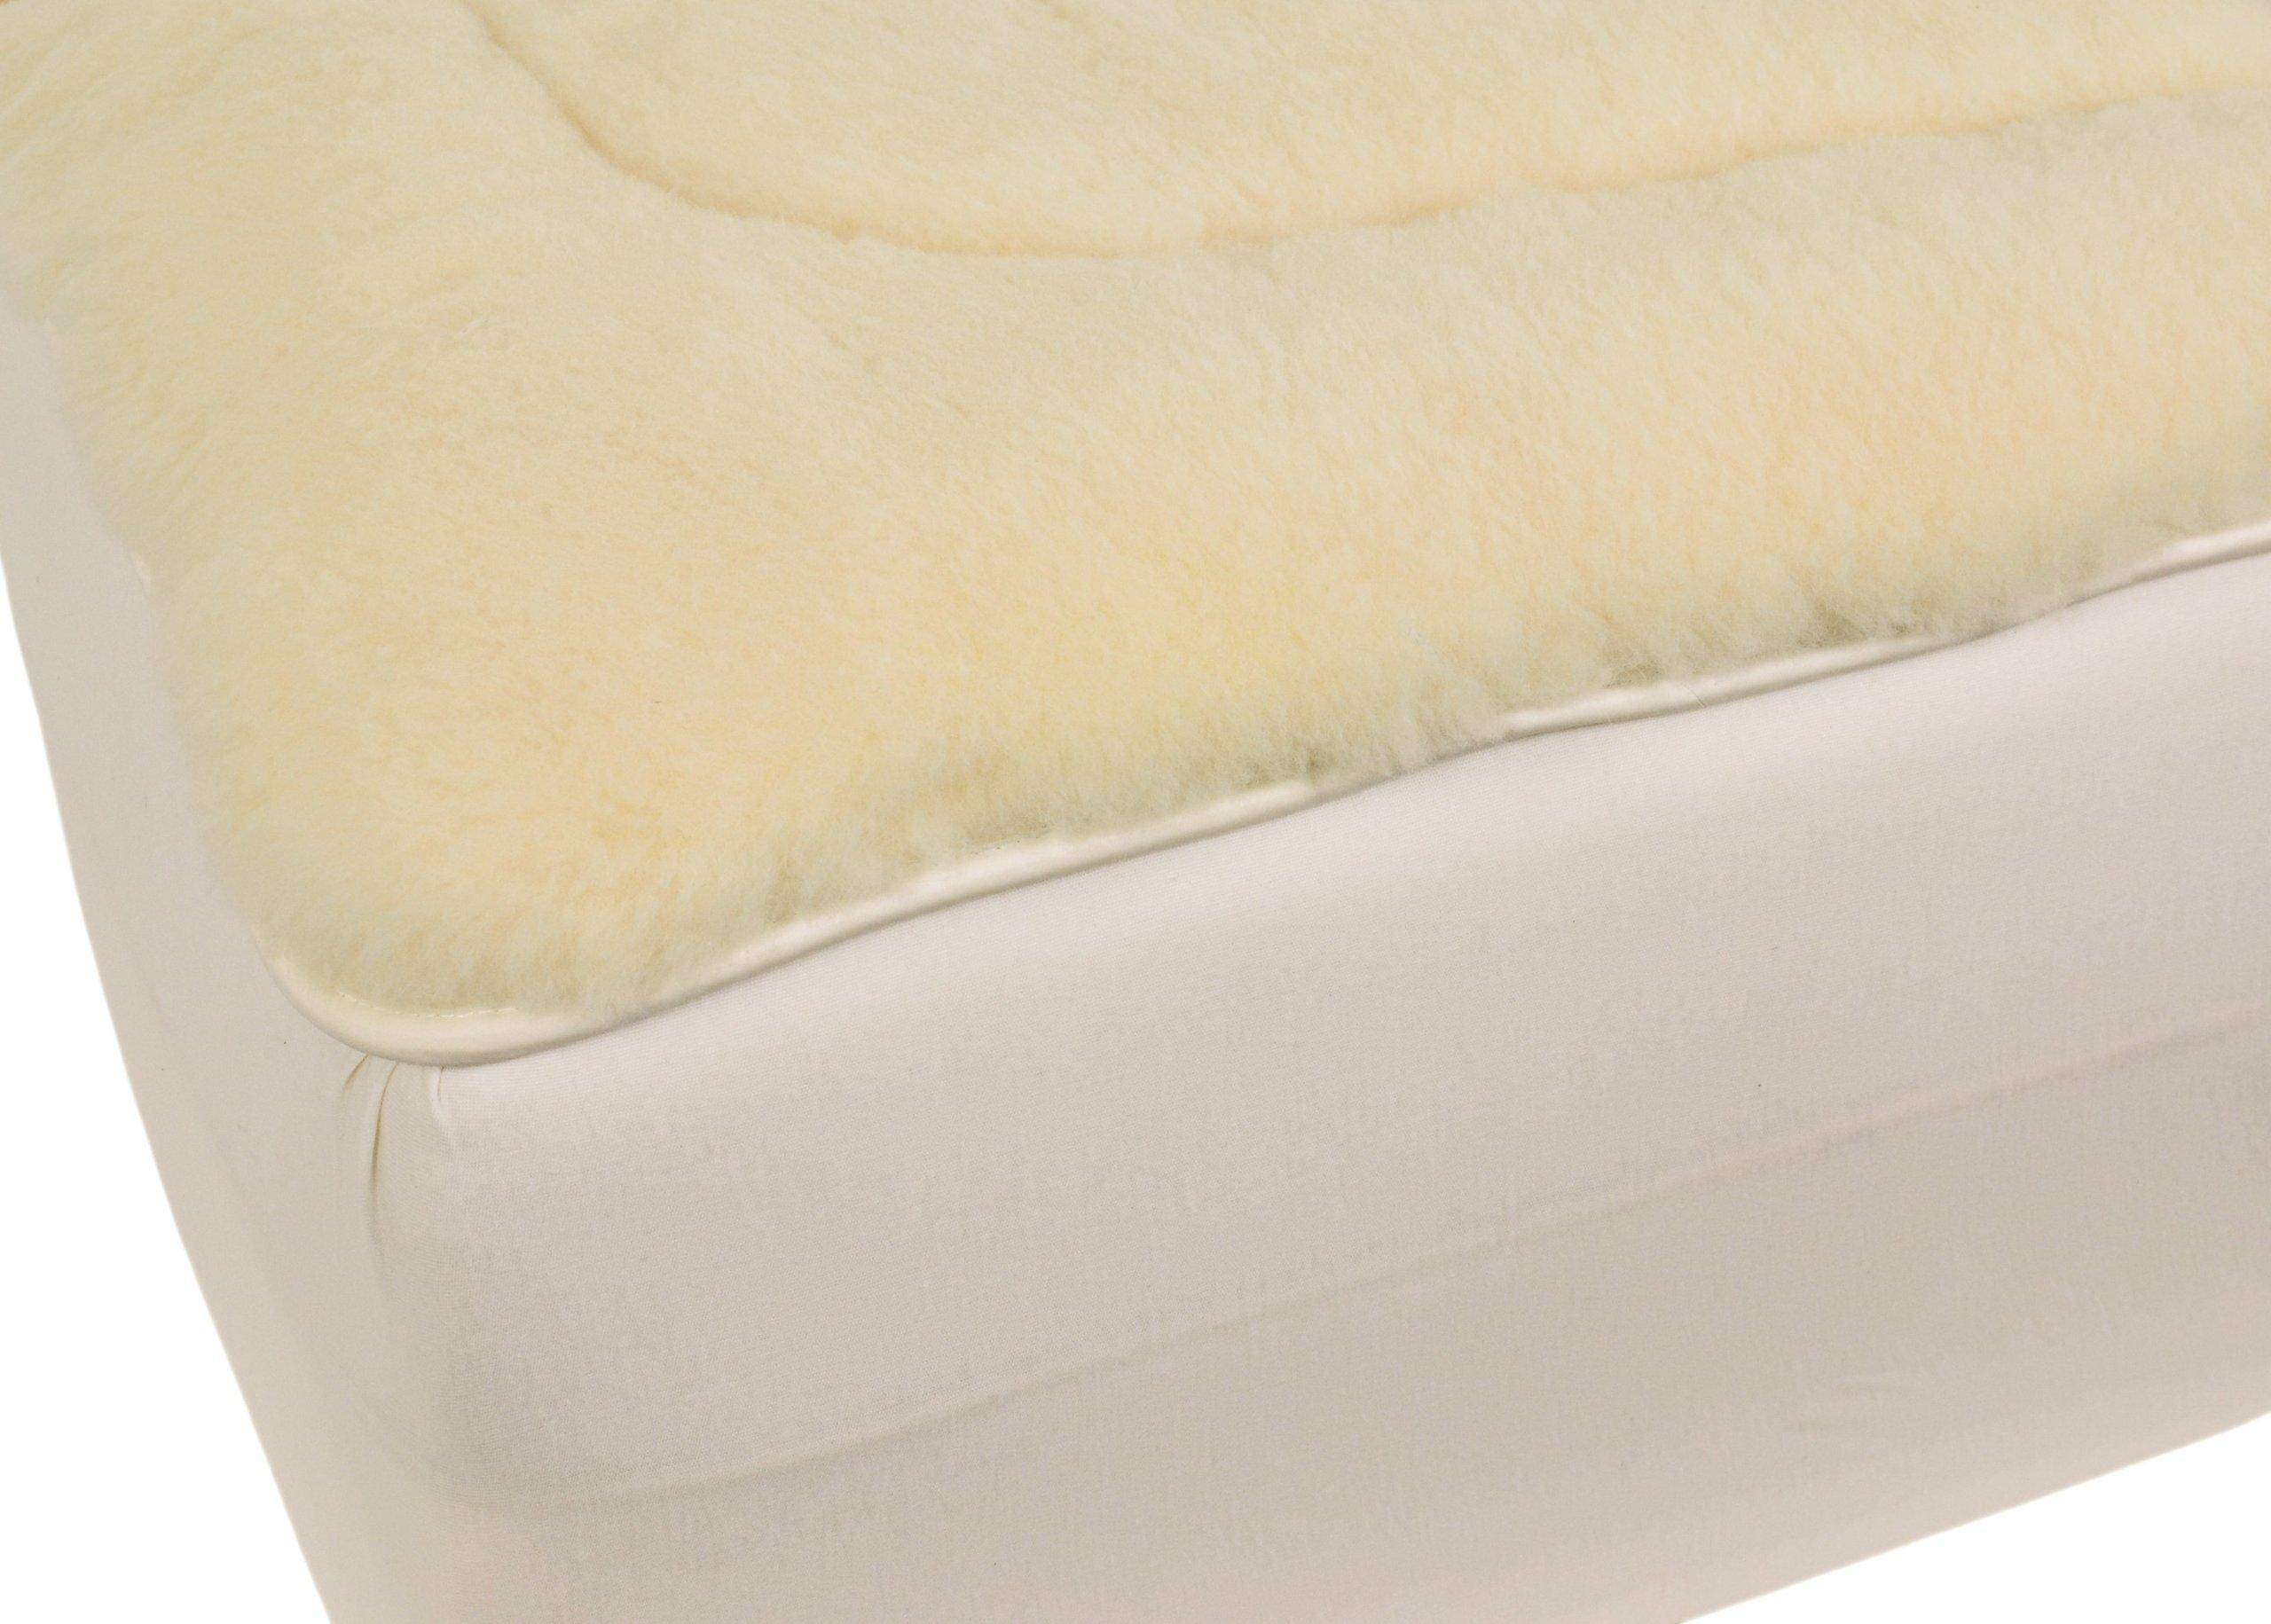 Cal Ripken Deluxe All-Natural 350 GSM Australian Merino Wool Reversible Mattress Pad by Herington, Natural